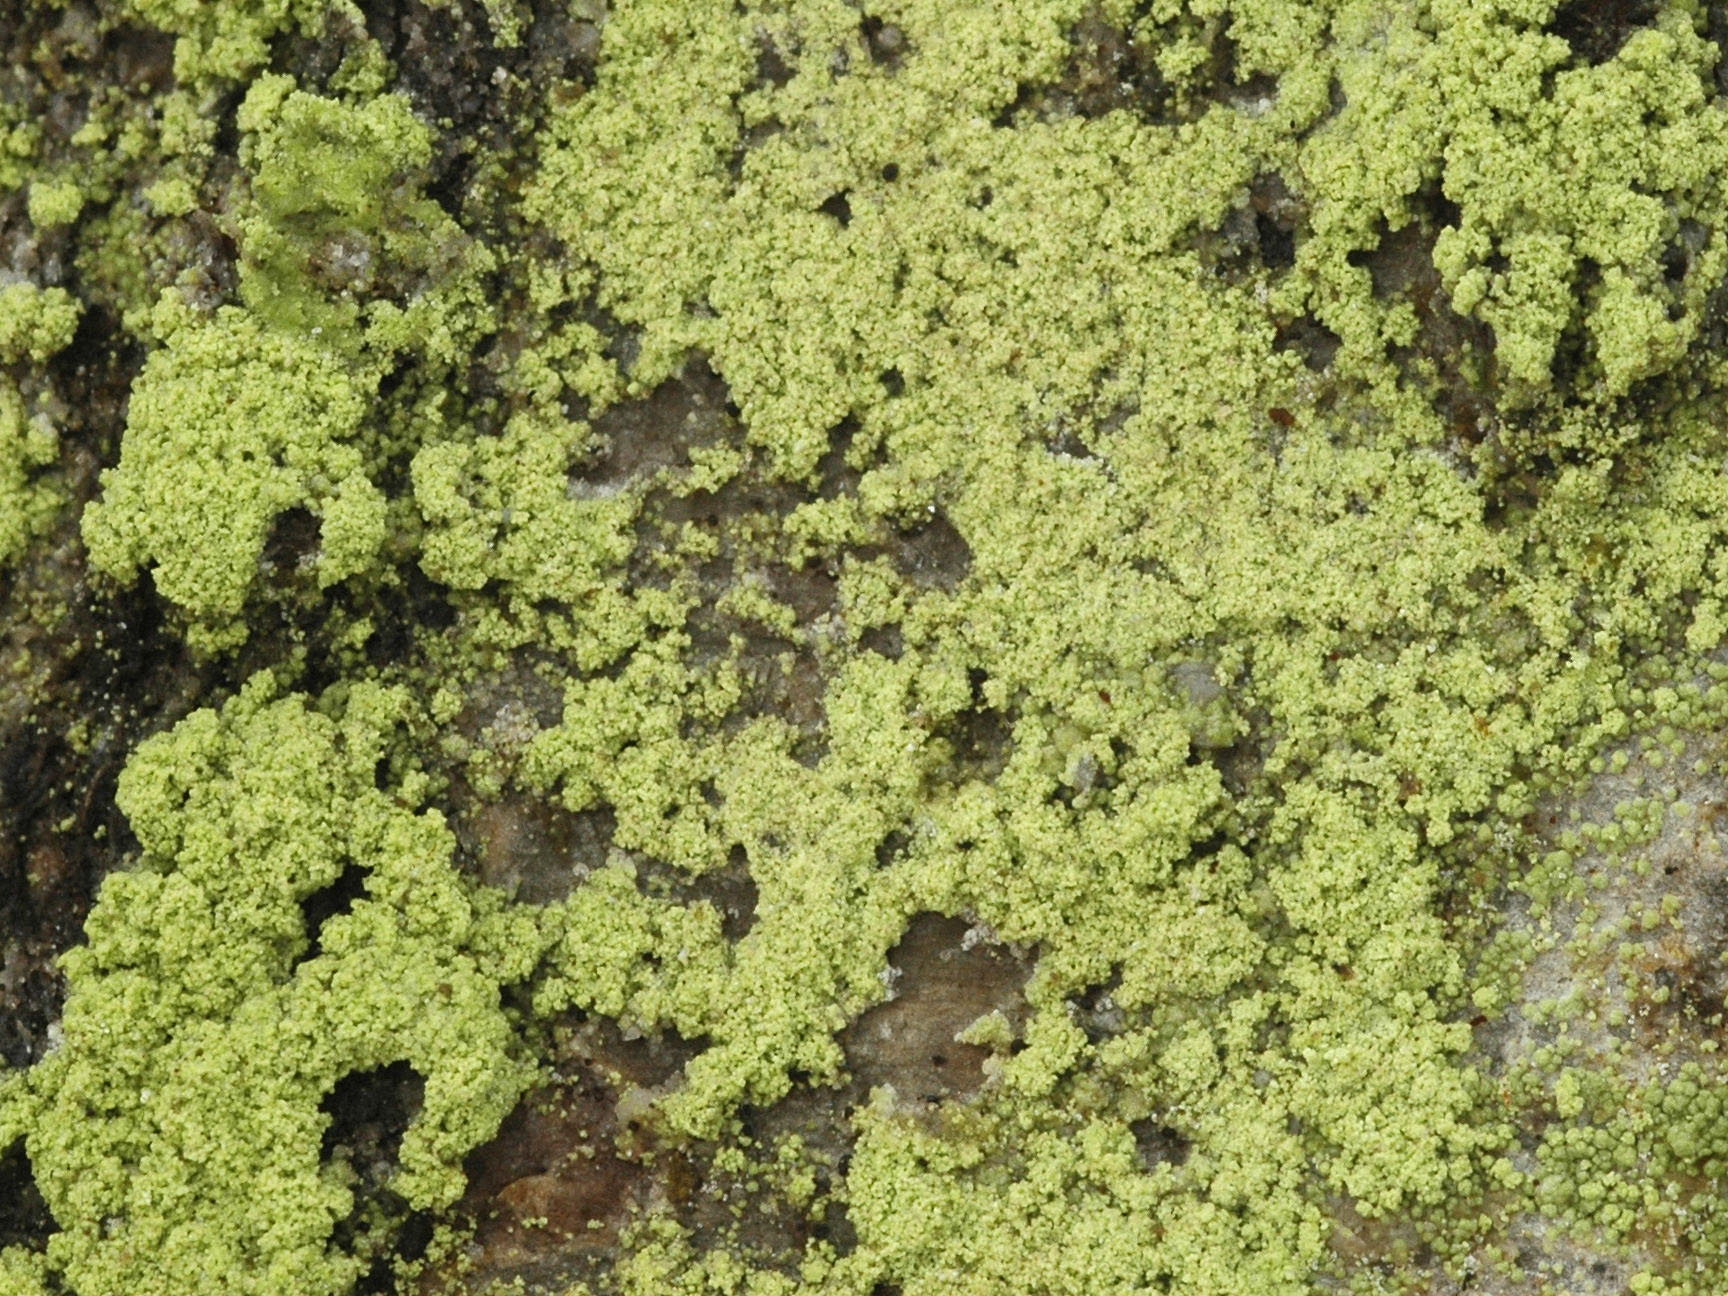 Biatora efflorescens